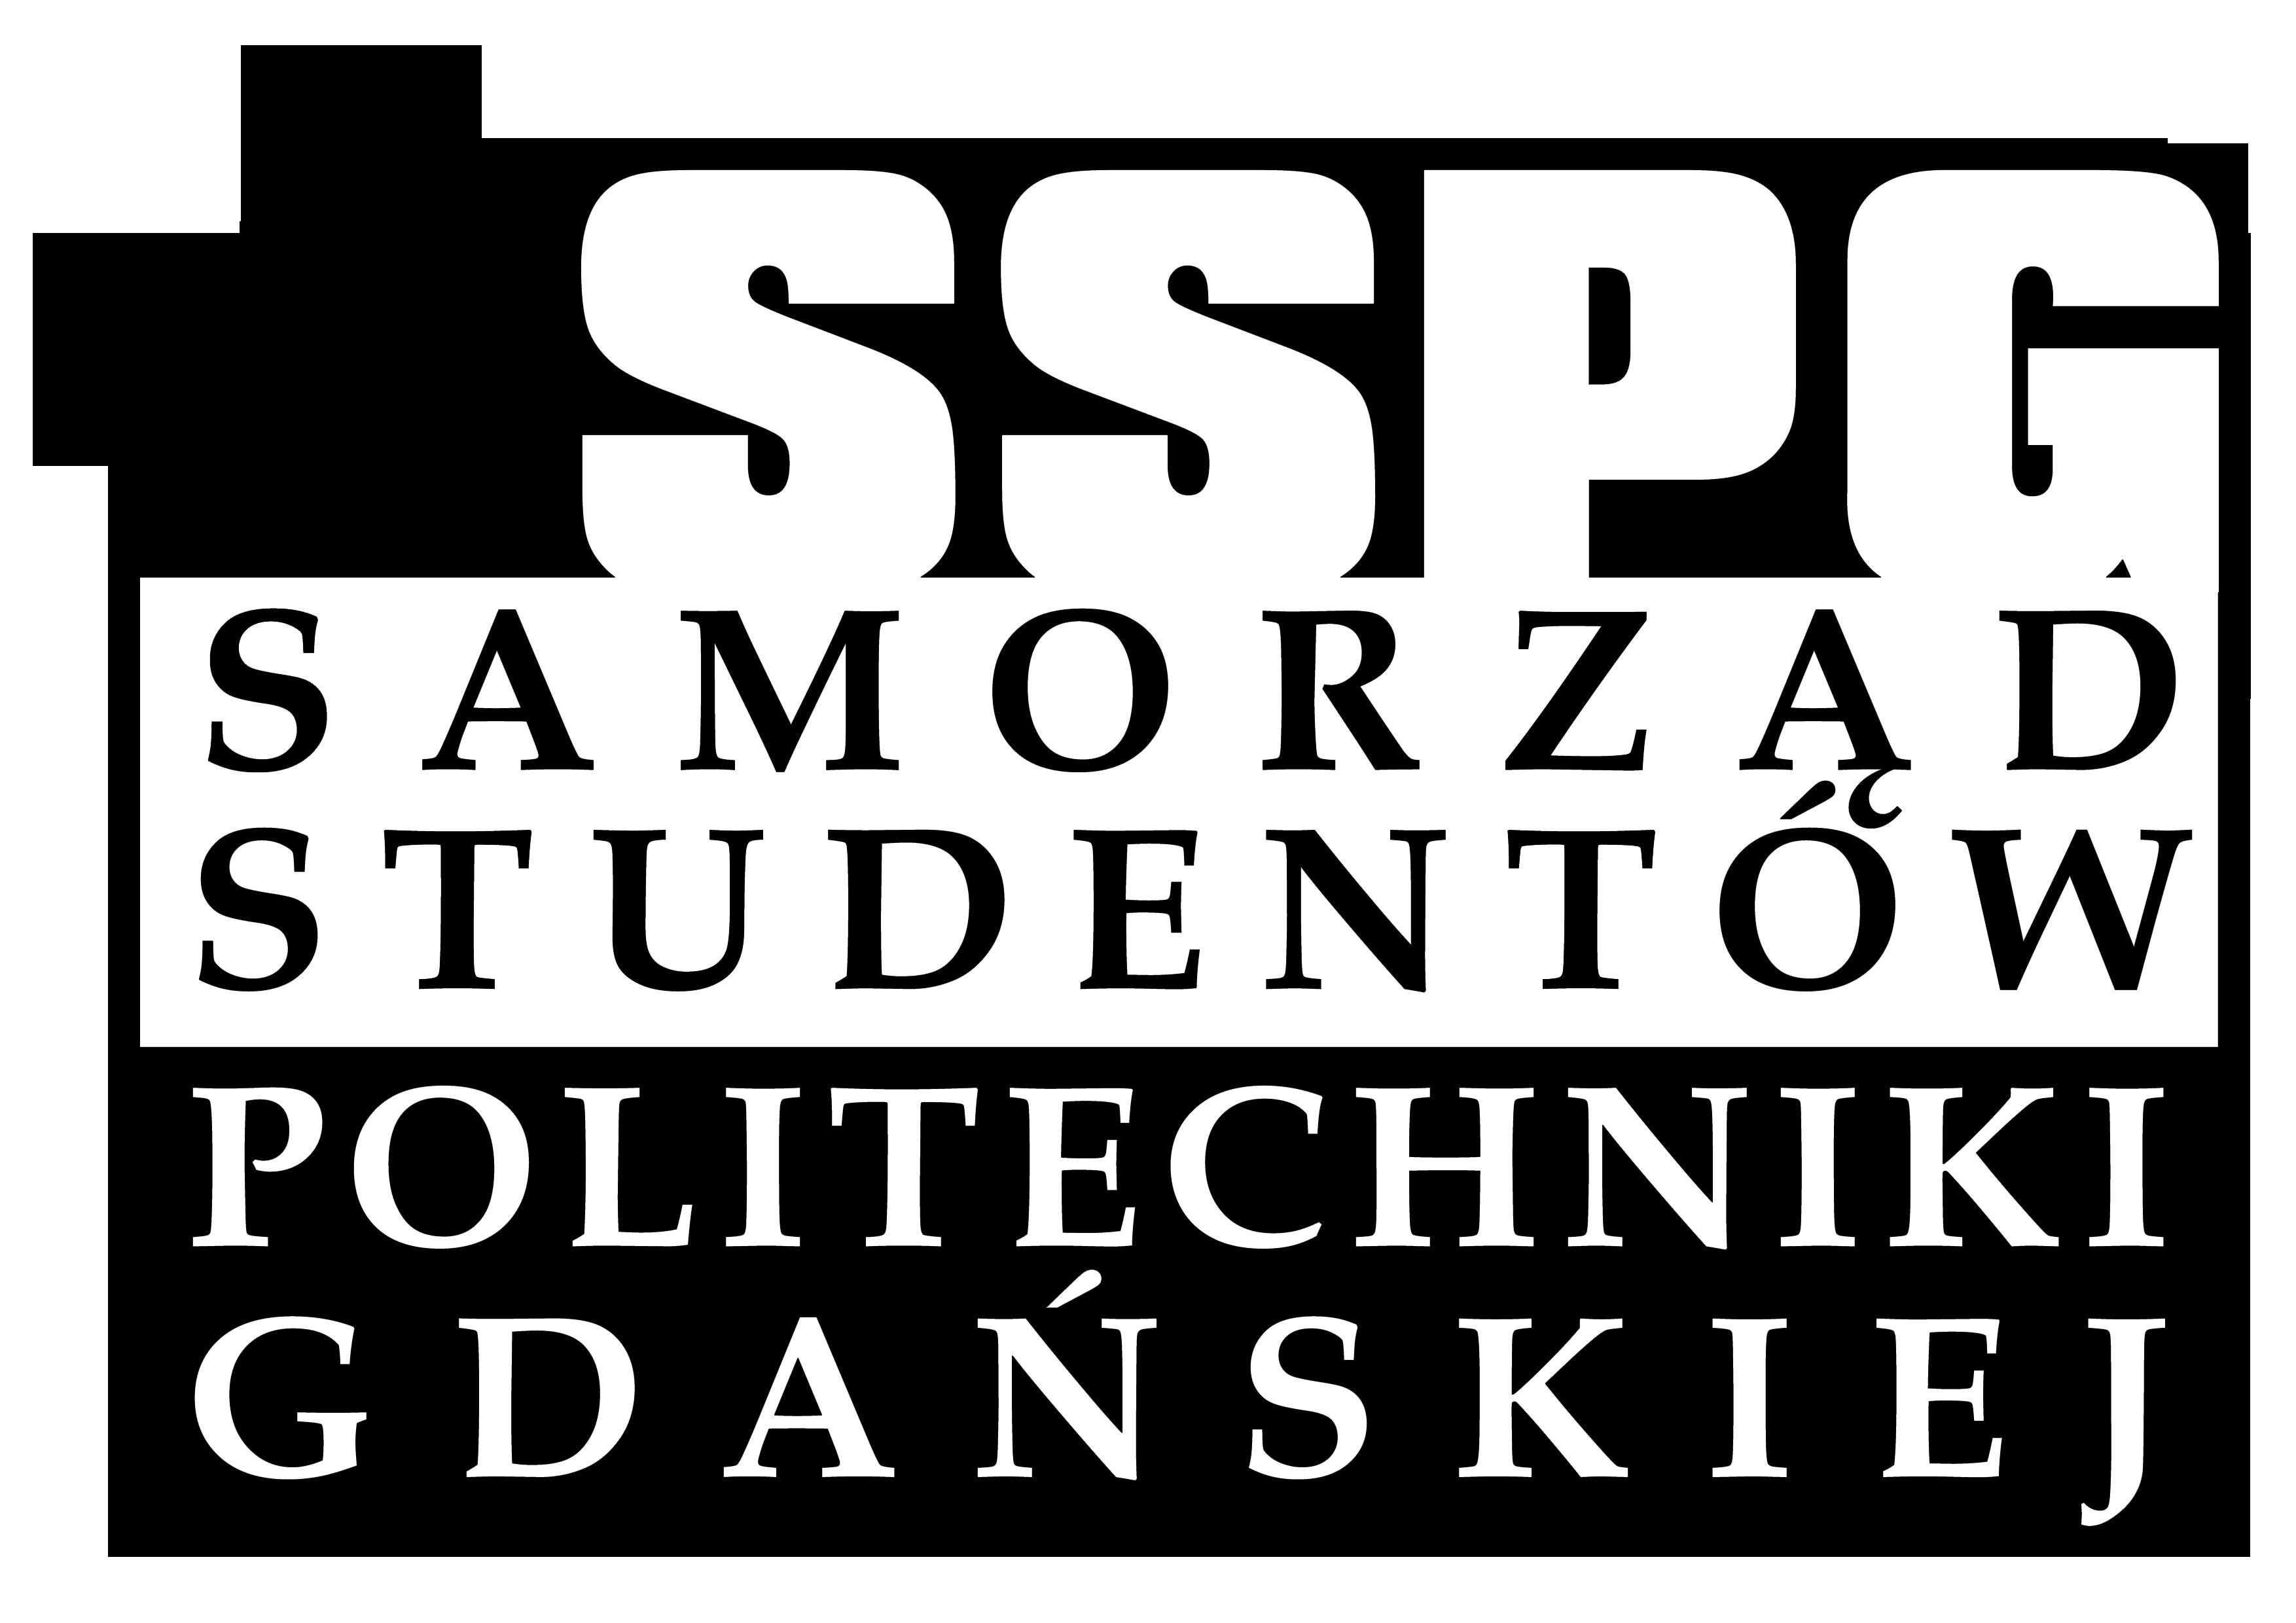 Czarne SSPG